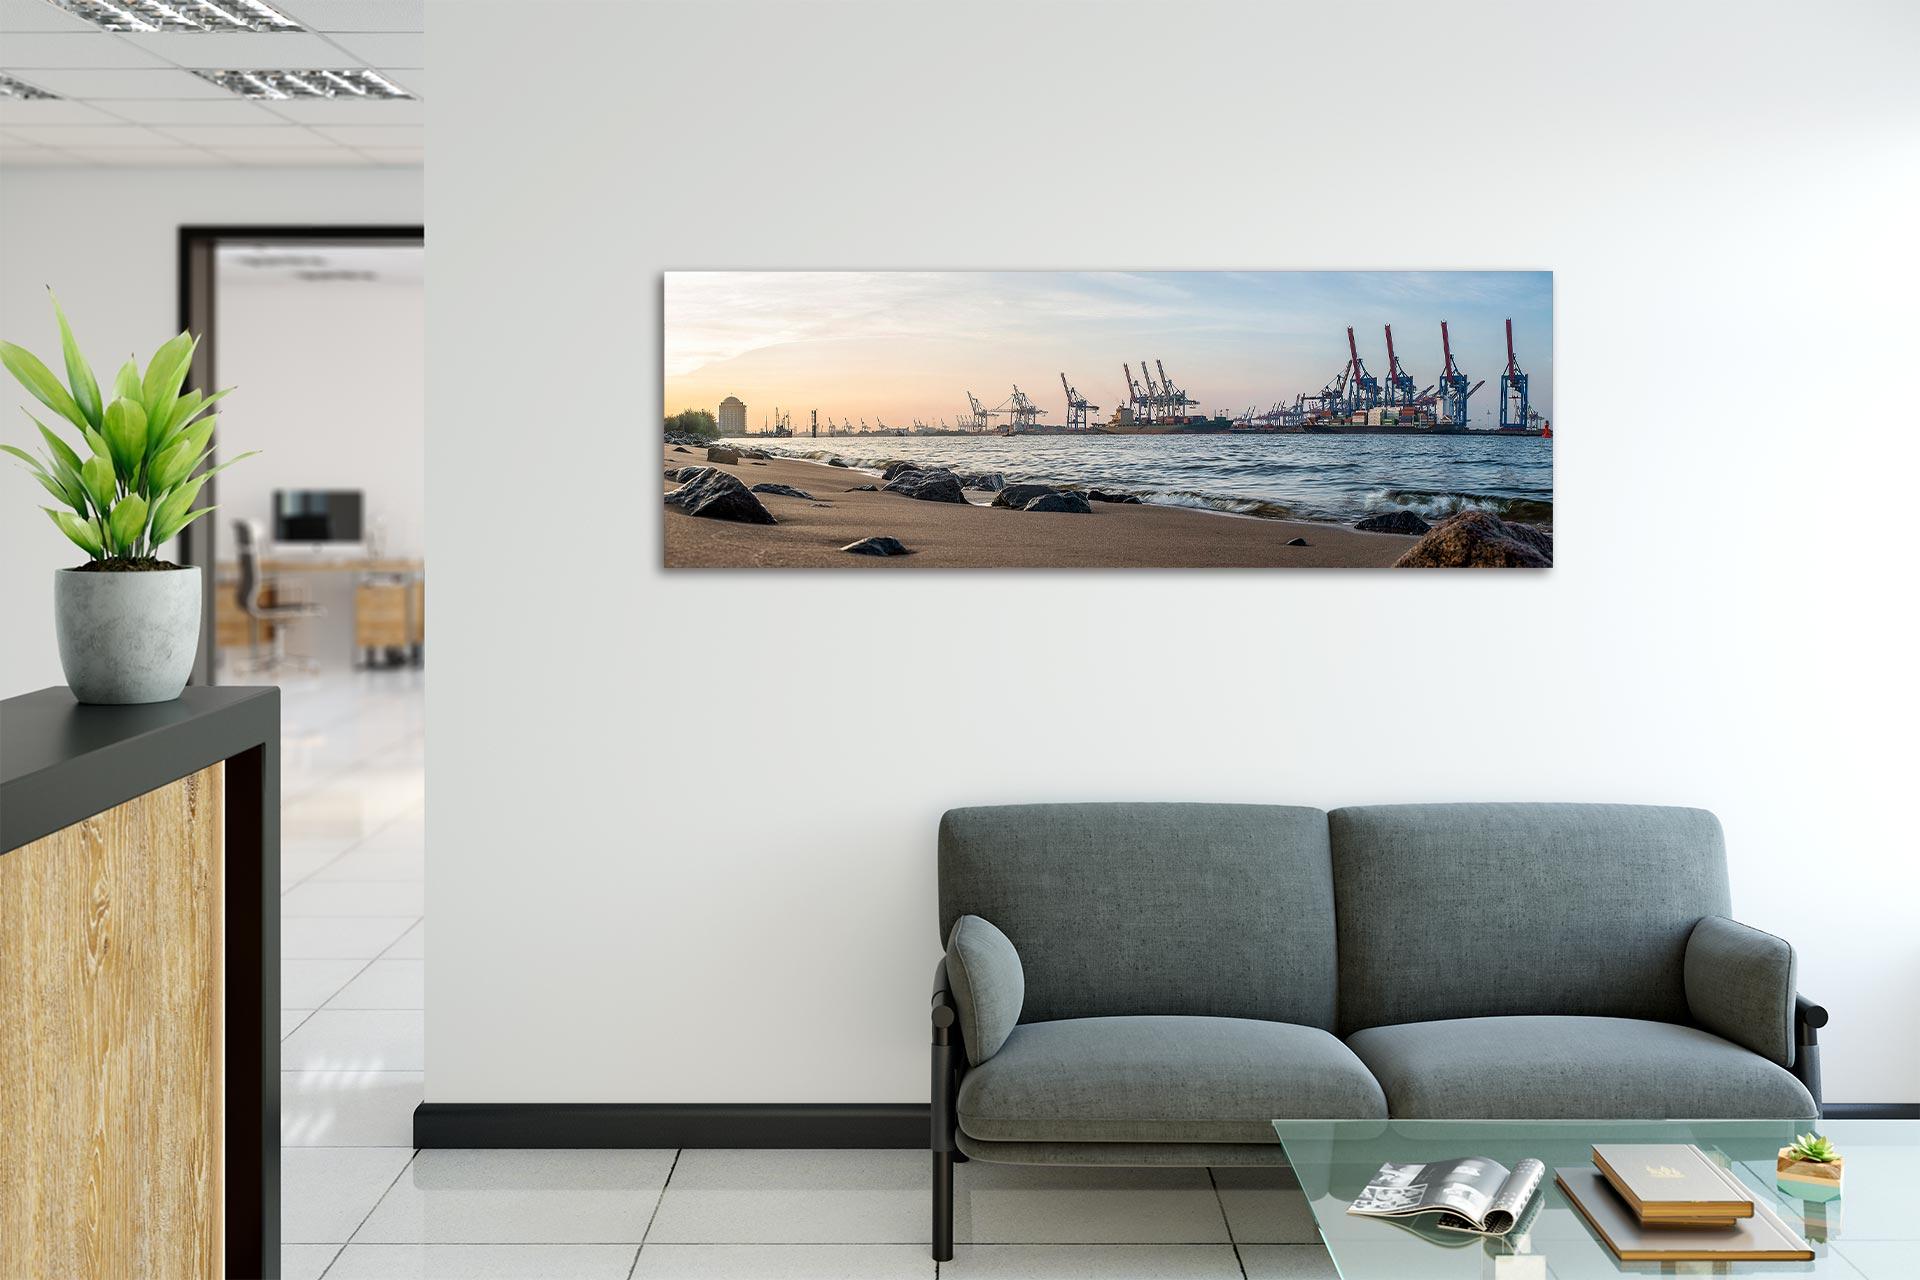 PSW046-panorama-elbstrand-hafen-leinwand-acrylglas-aludibond-empfang